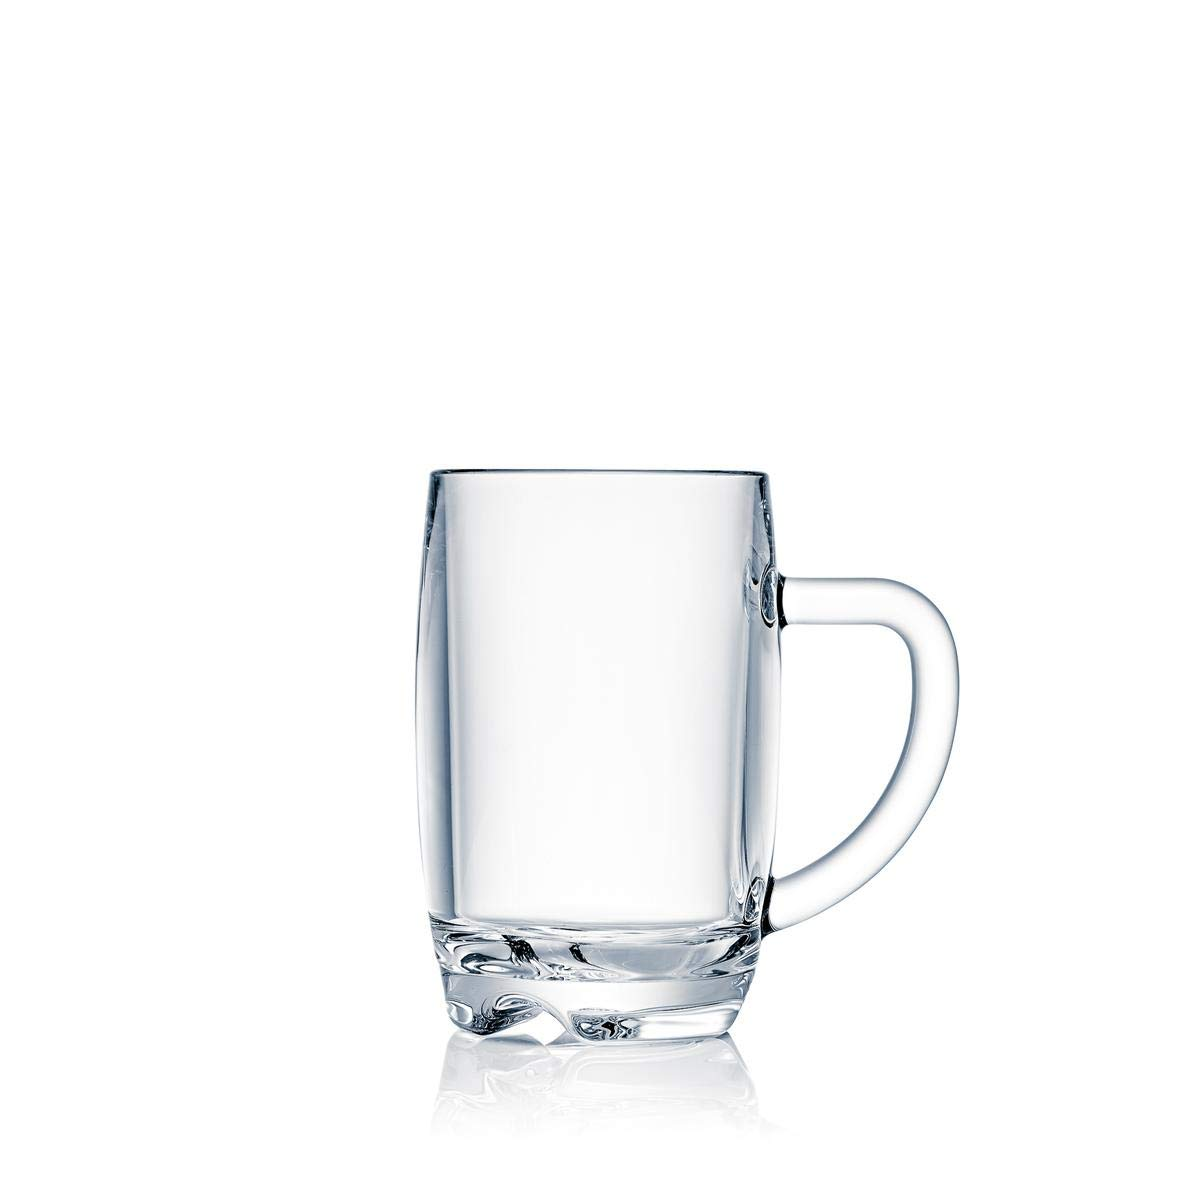 Strahl 11300 Vivaldi 15-oz Beer Mug, Set of 4